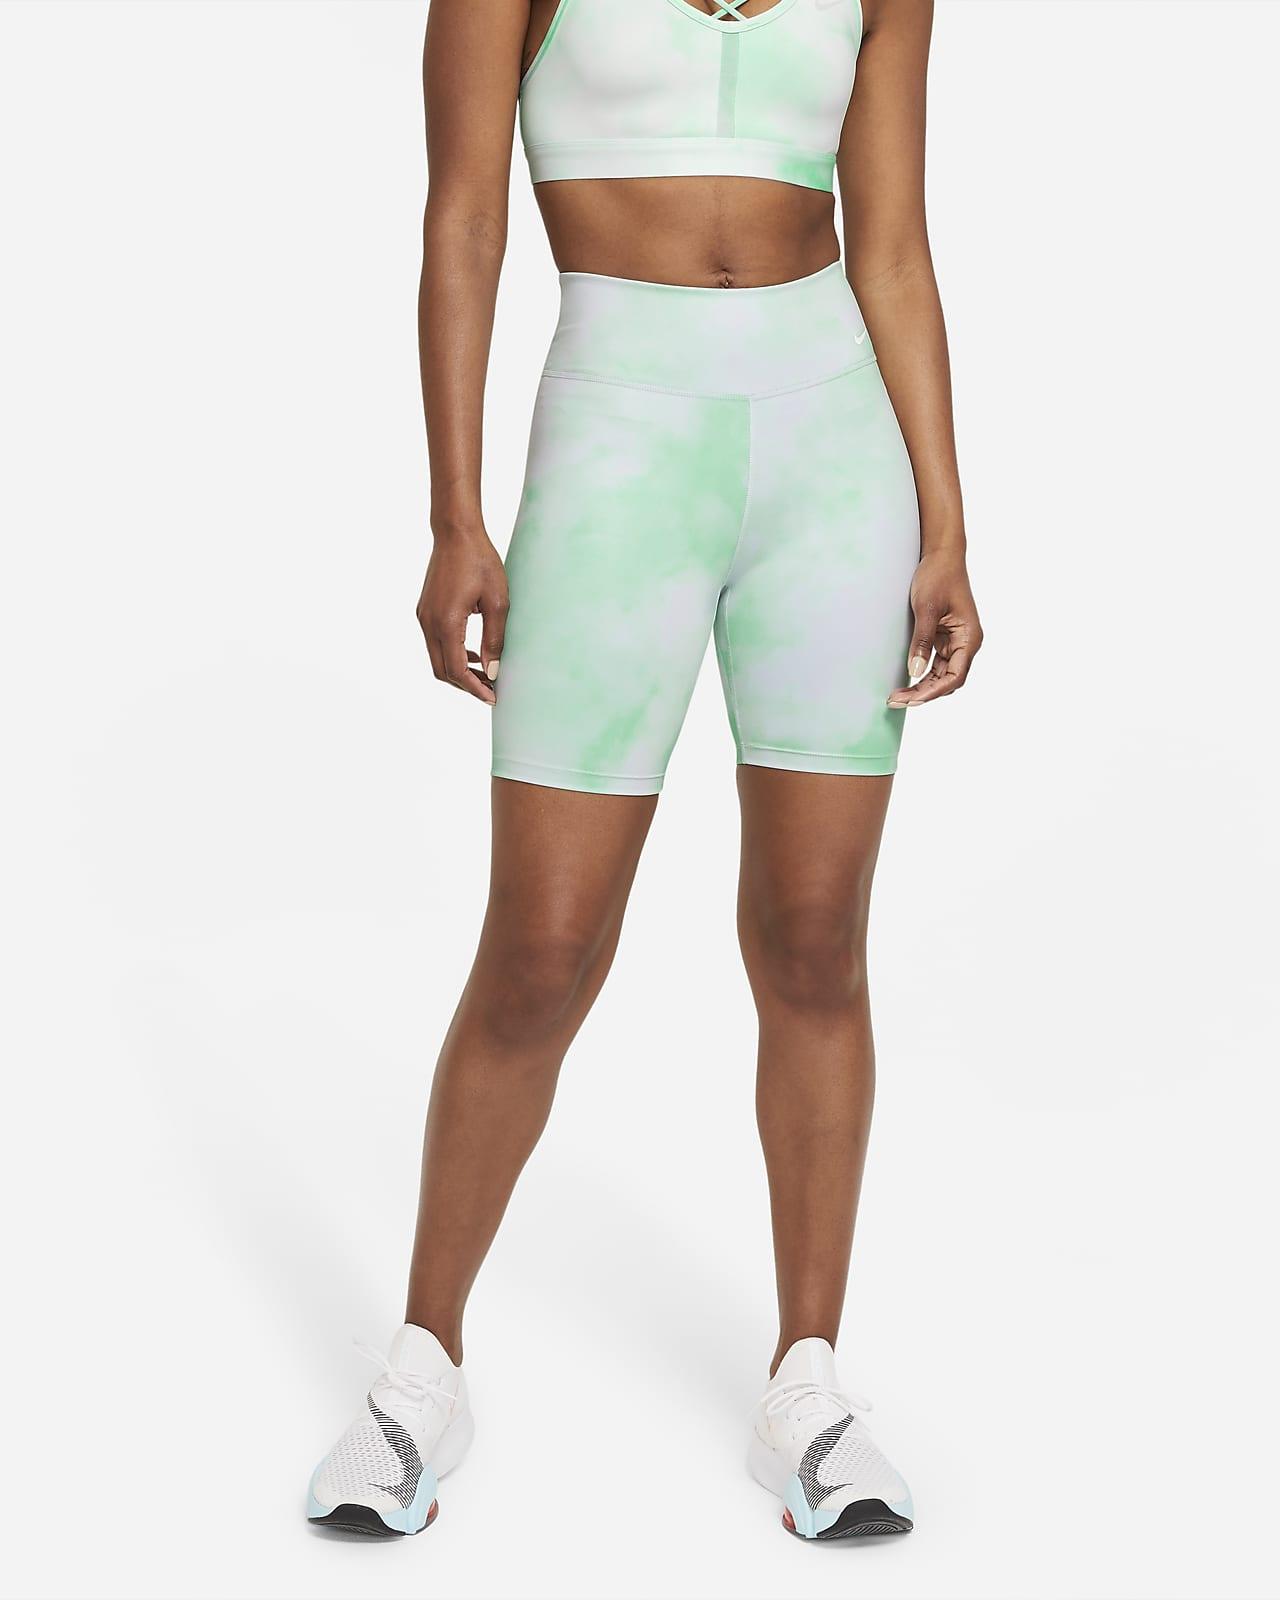 Женские шорты с принтом Nike One Icon Clash 18 см